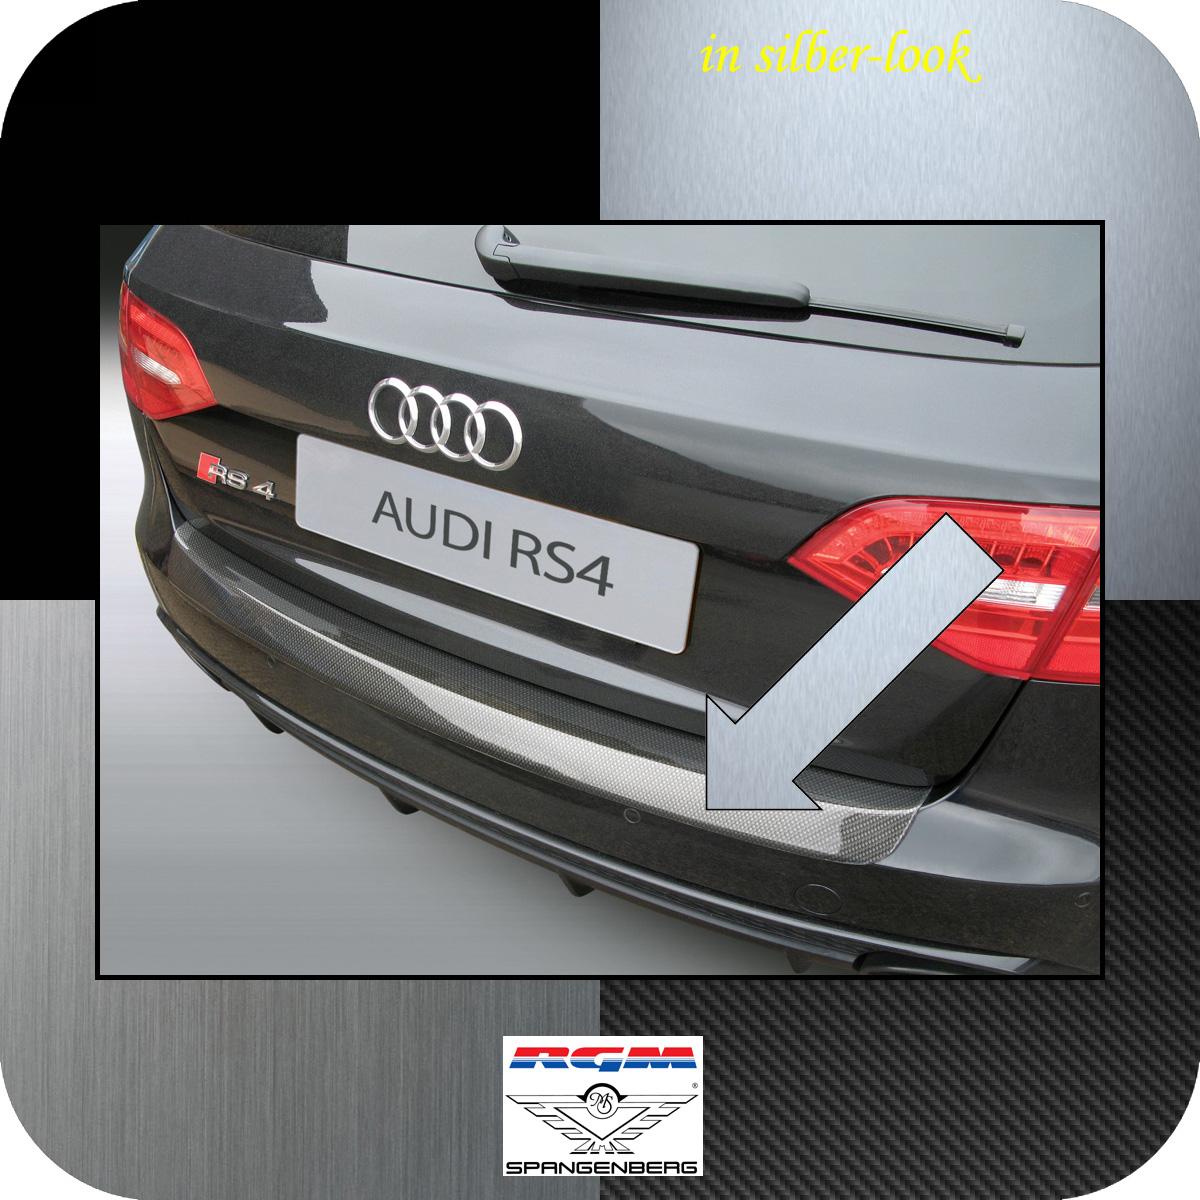 Ladekantenschutz Silber-Look Audi A4 Avant B8 nur RS4 Quattro 2012-16 3506699